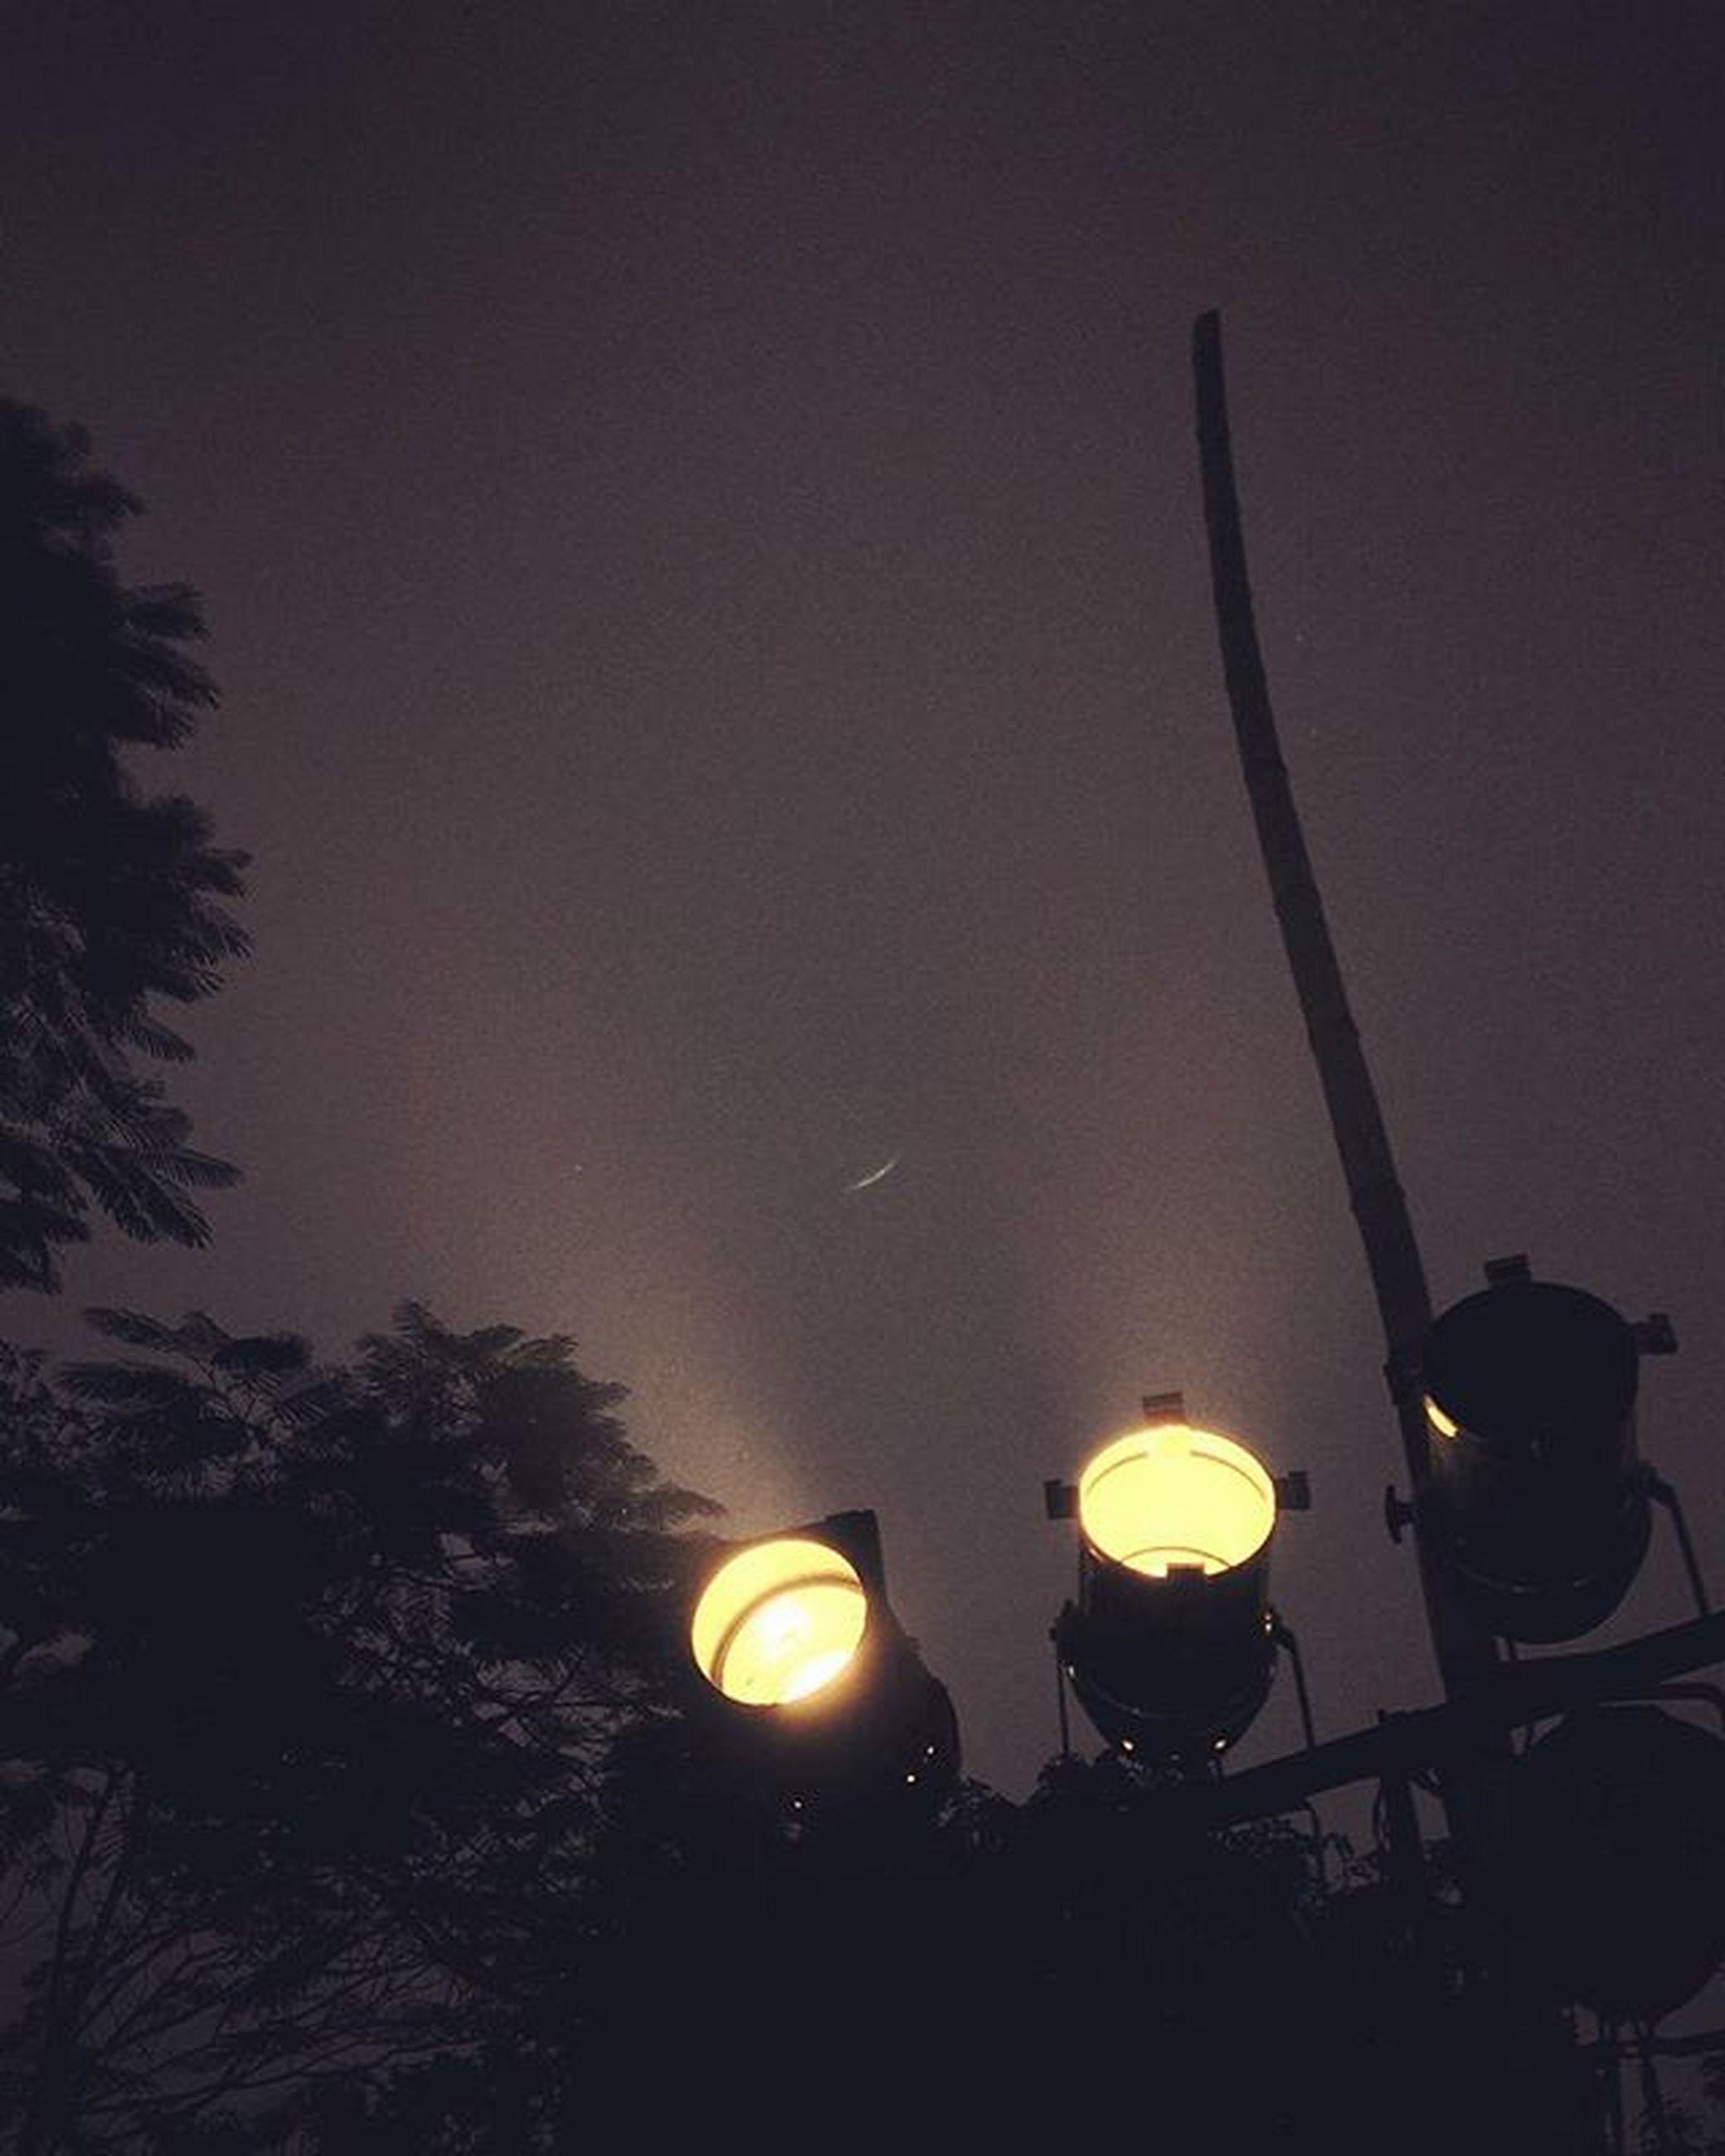 illuminated, lighting equipment, night, tree, glowing, street light, decoration, hanging, low angle view, silhouette, lantern, lit, light - natural phenomenon, electric lamp, flame, dusk, electricity, burning, electric light, dark